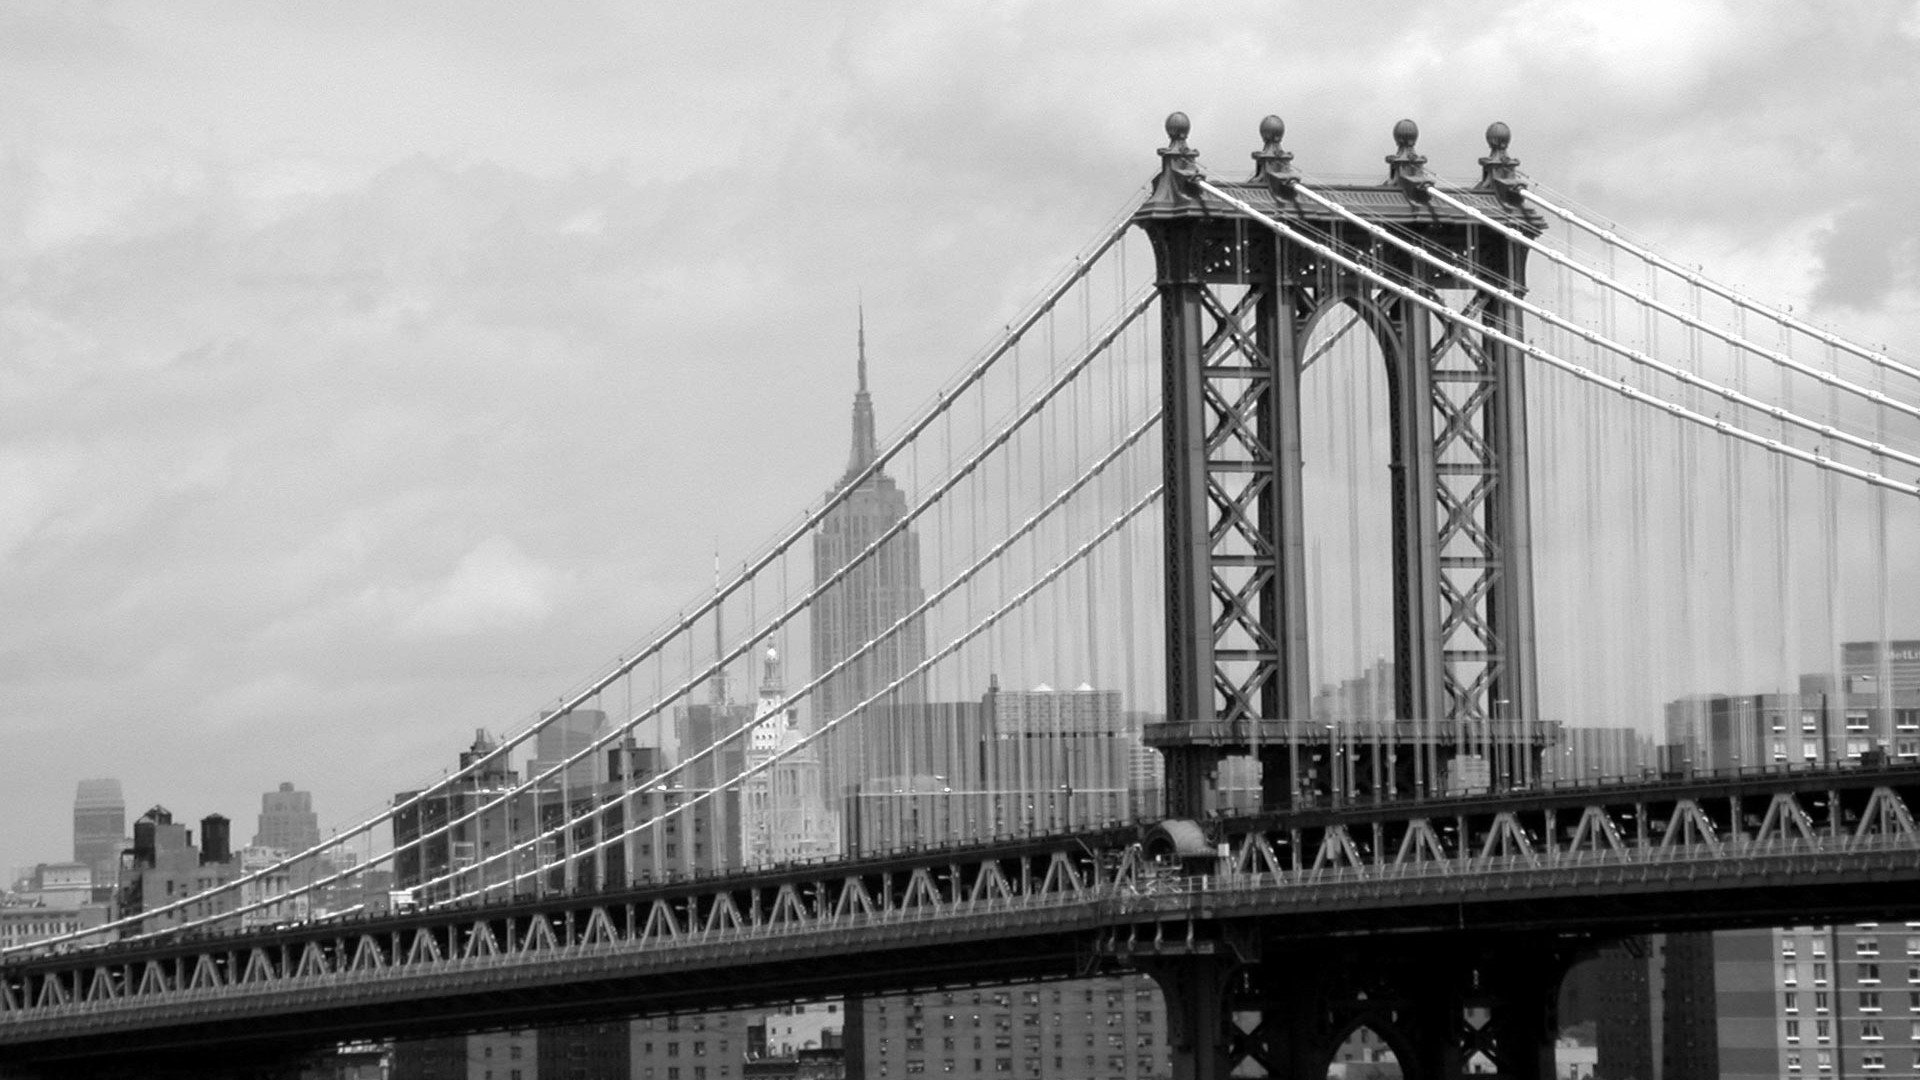 New York Bridge In Stunning HD Wallpaper